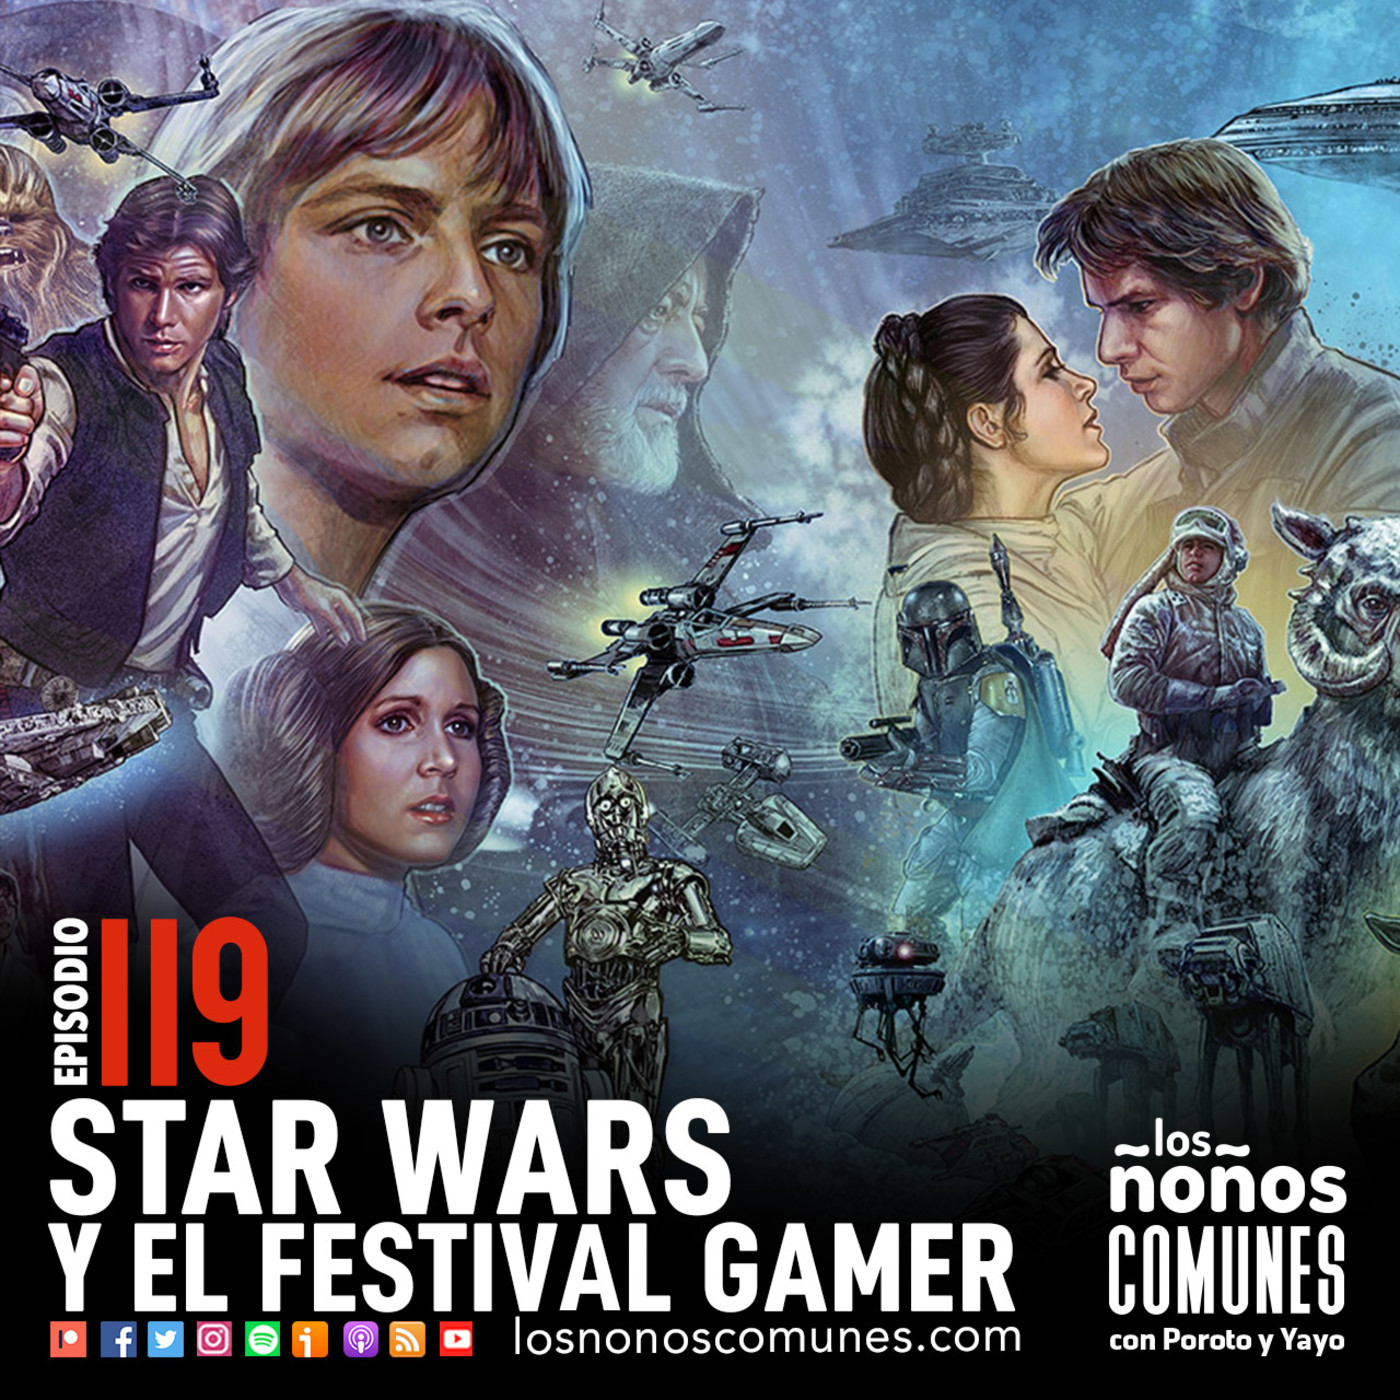 Ep 119: Star Wars y El Festival Gamer